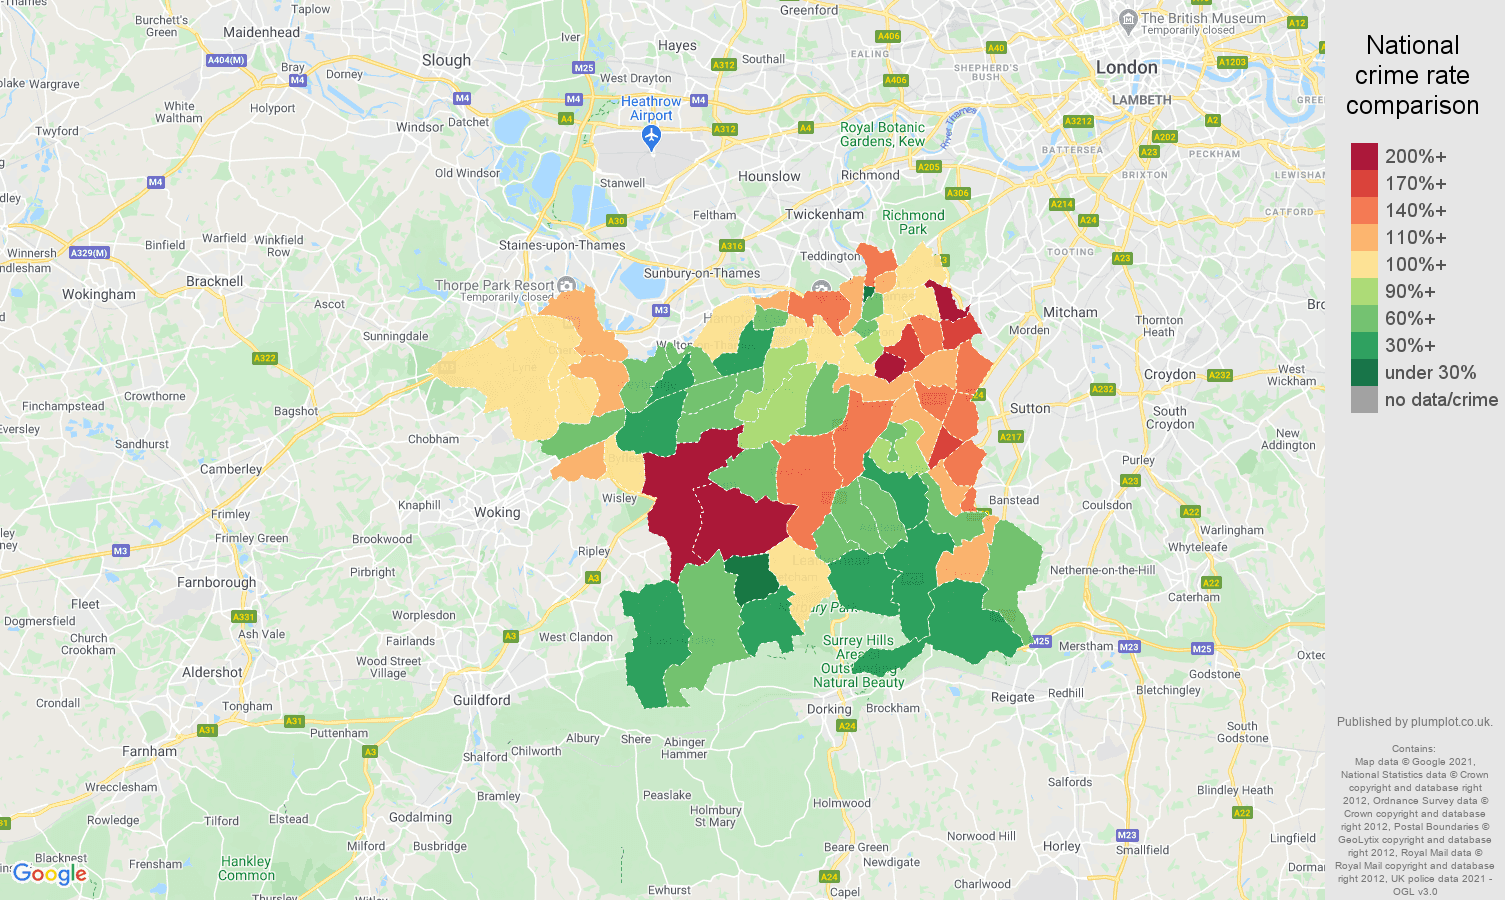 Kingston upon Thames vehicle crime rate comparison map